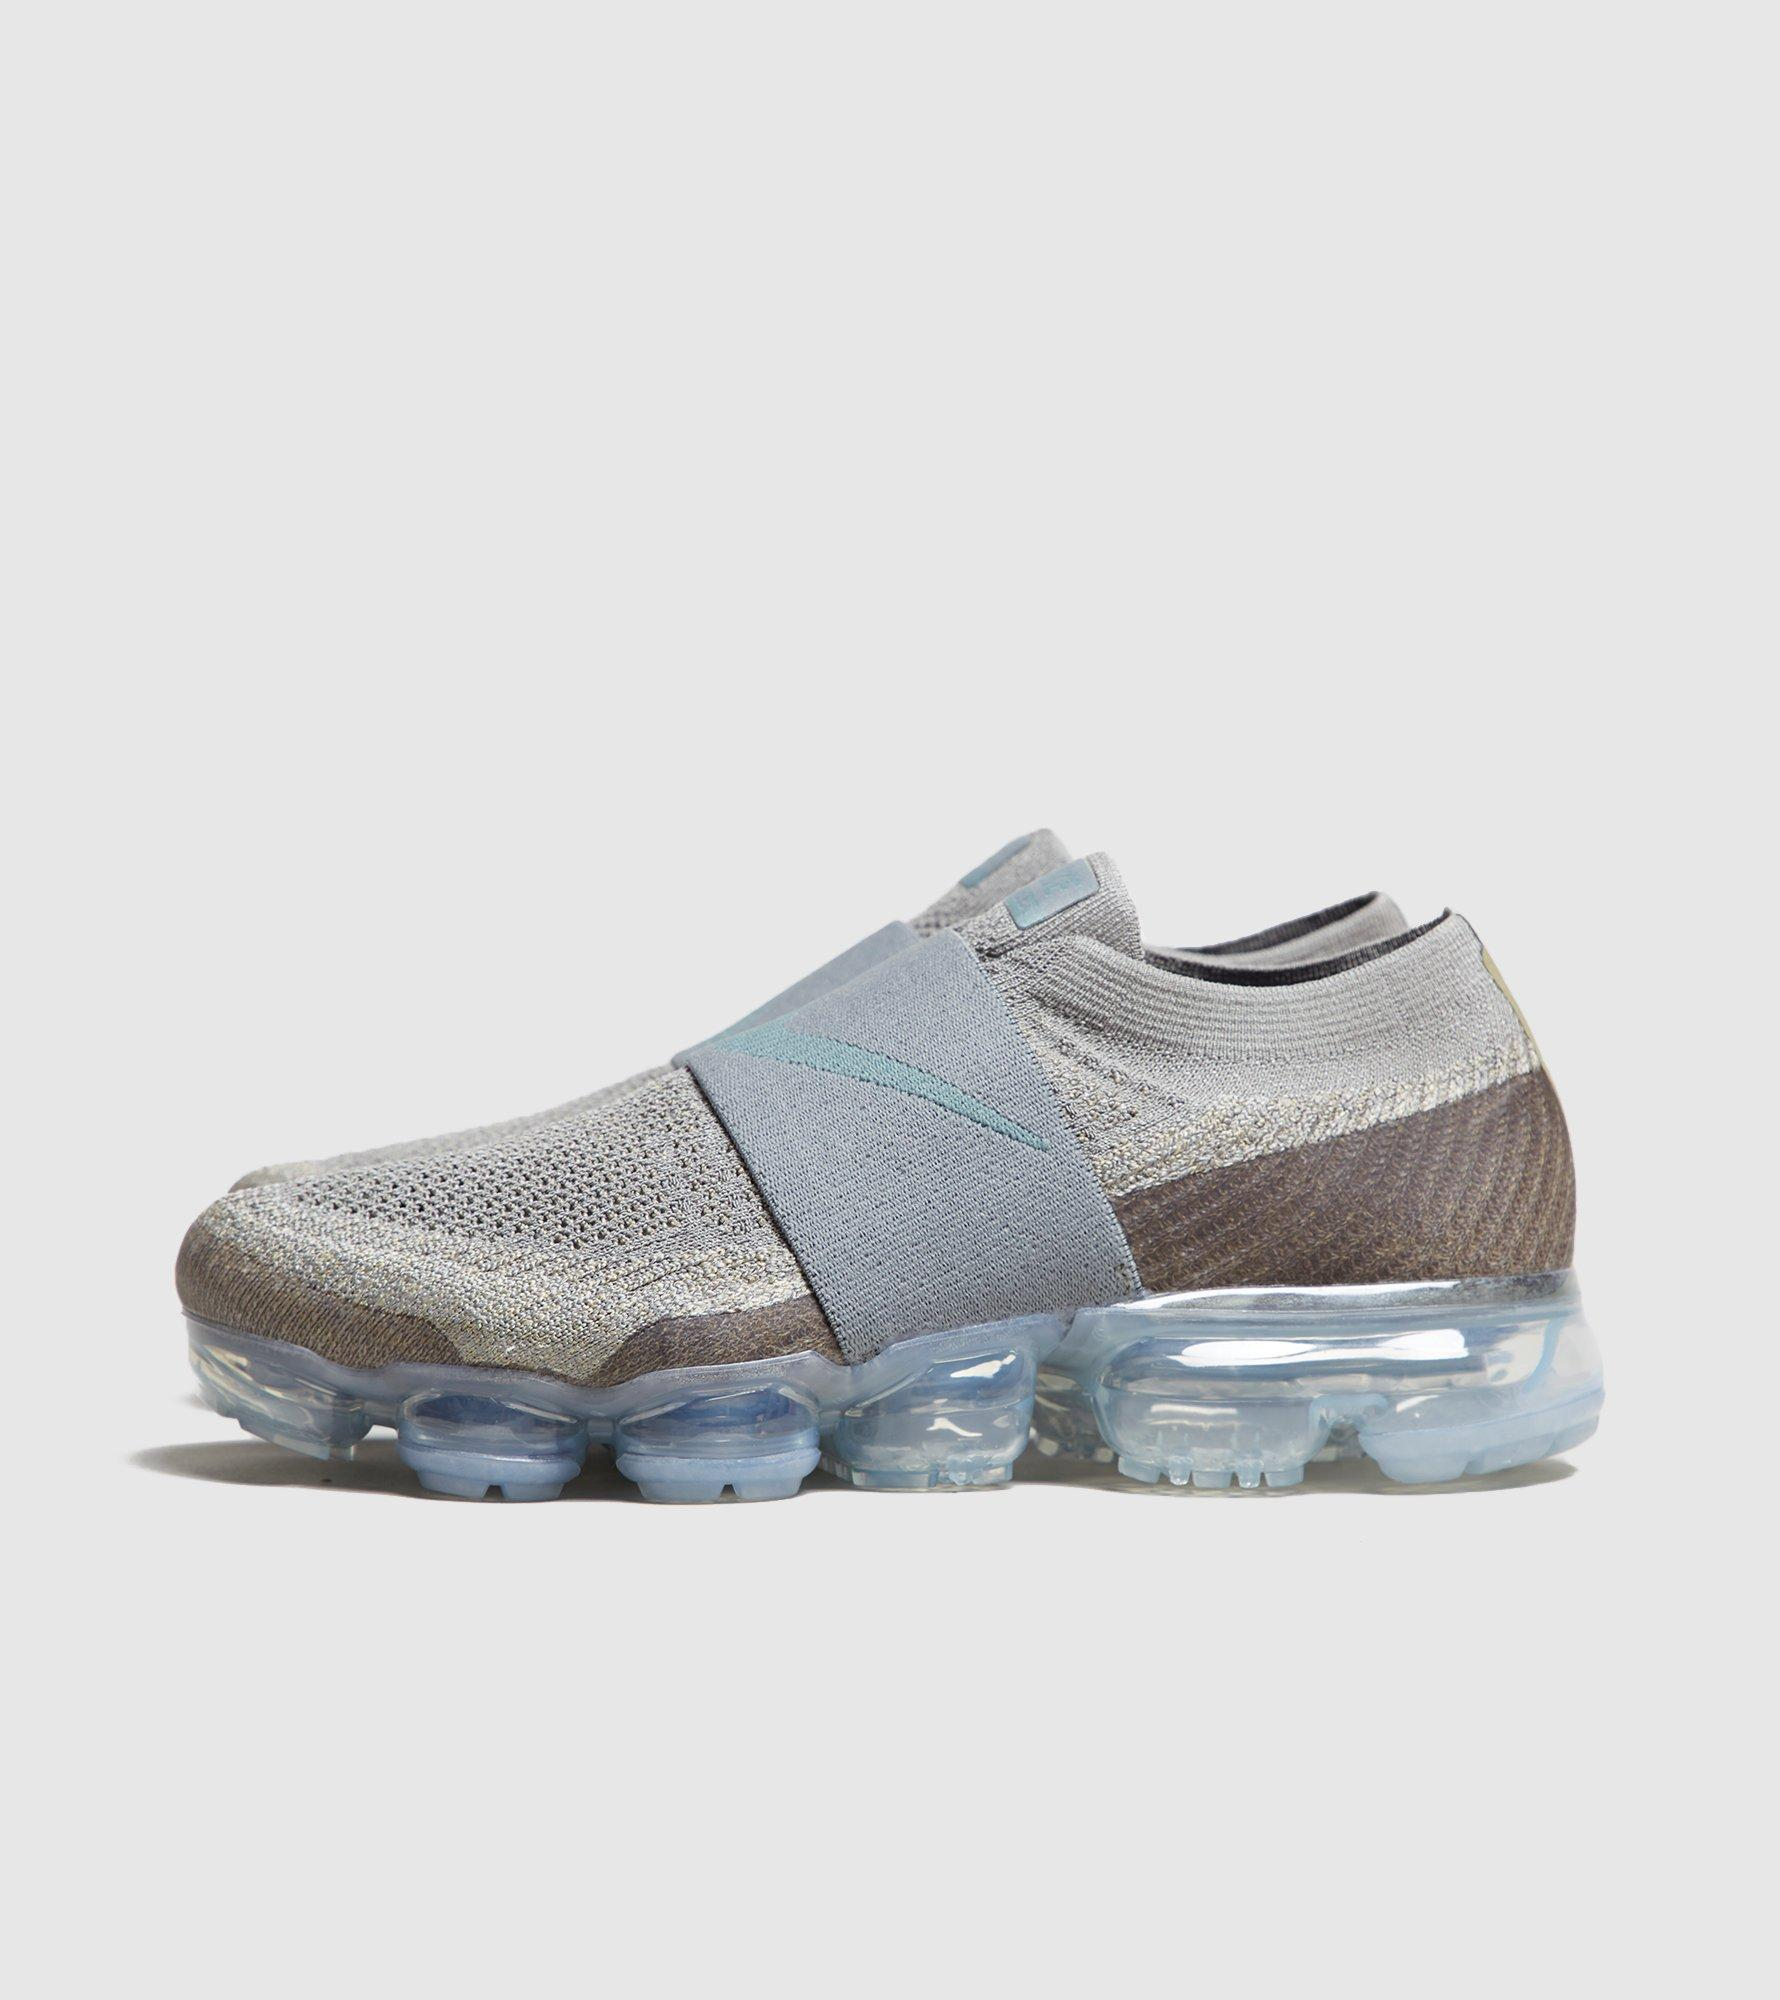 Nike Vapormax Flyknit Mujeres Más Moc